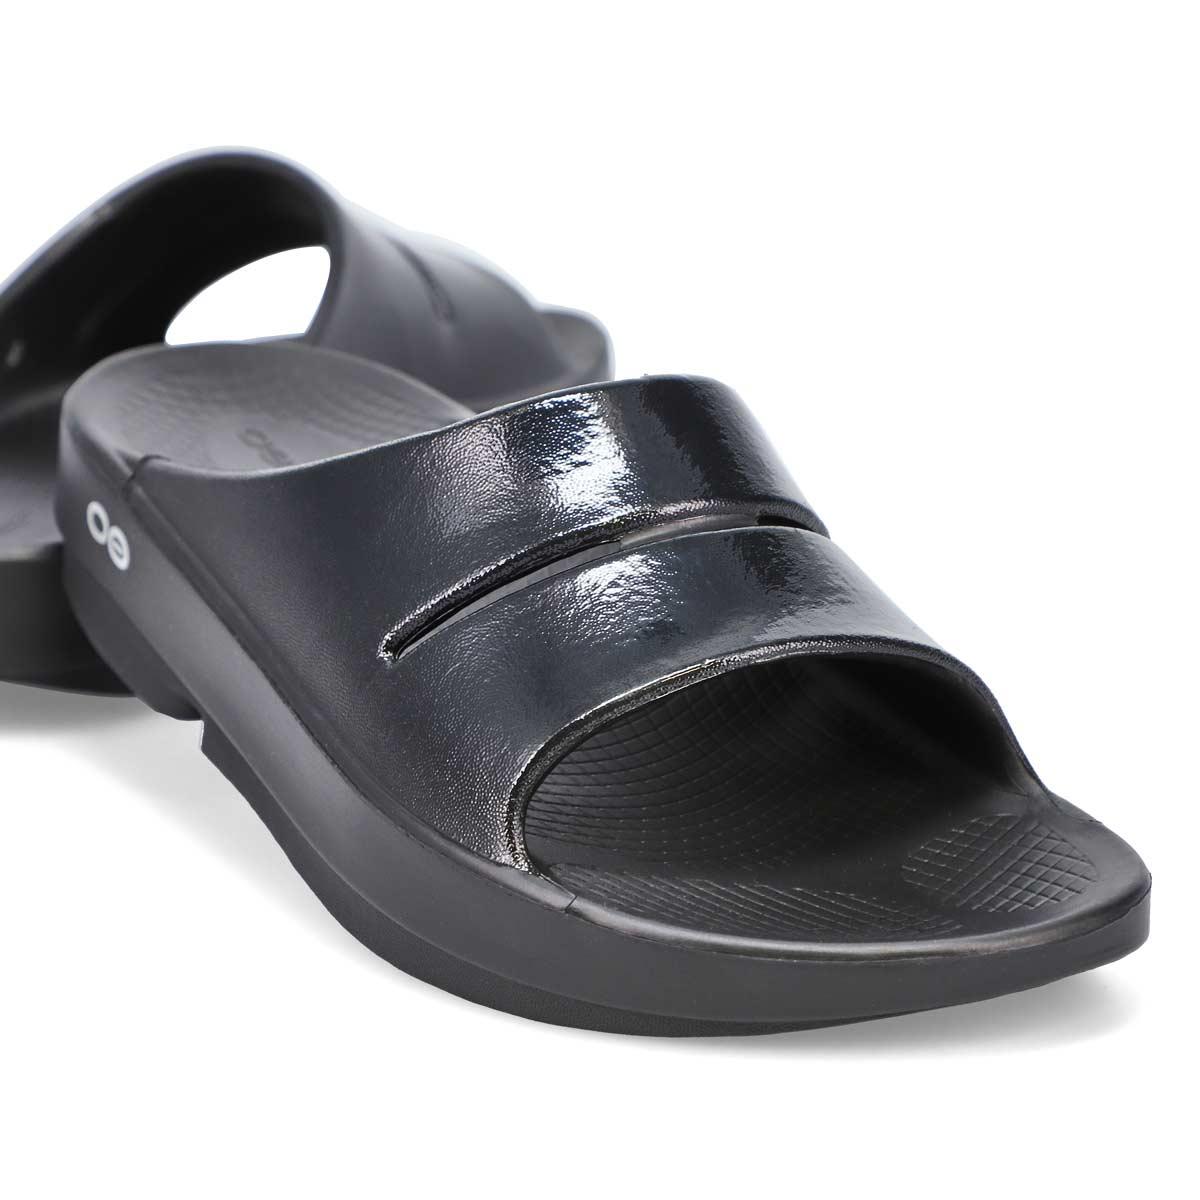 Women's Ooahh Luxe Sandal - Black